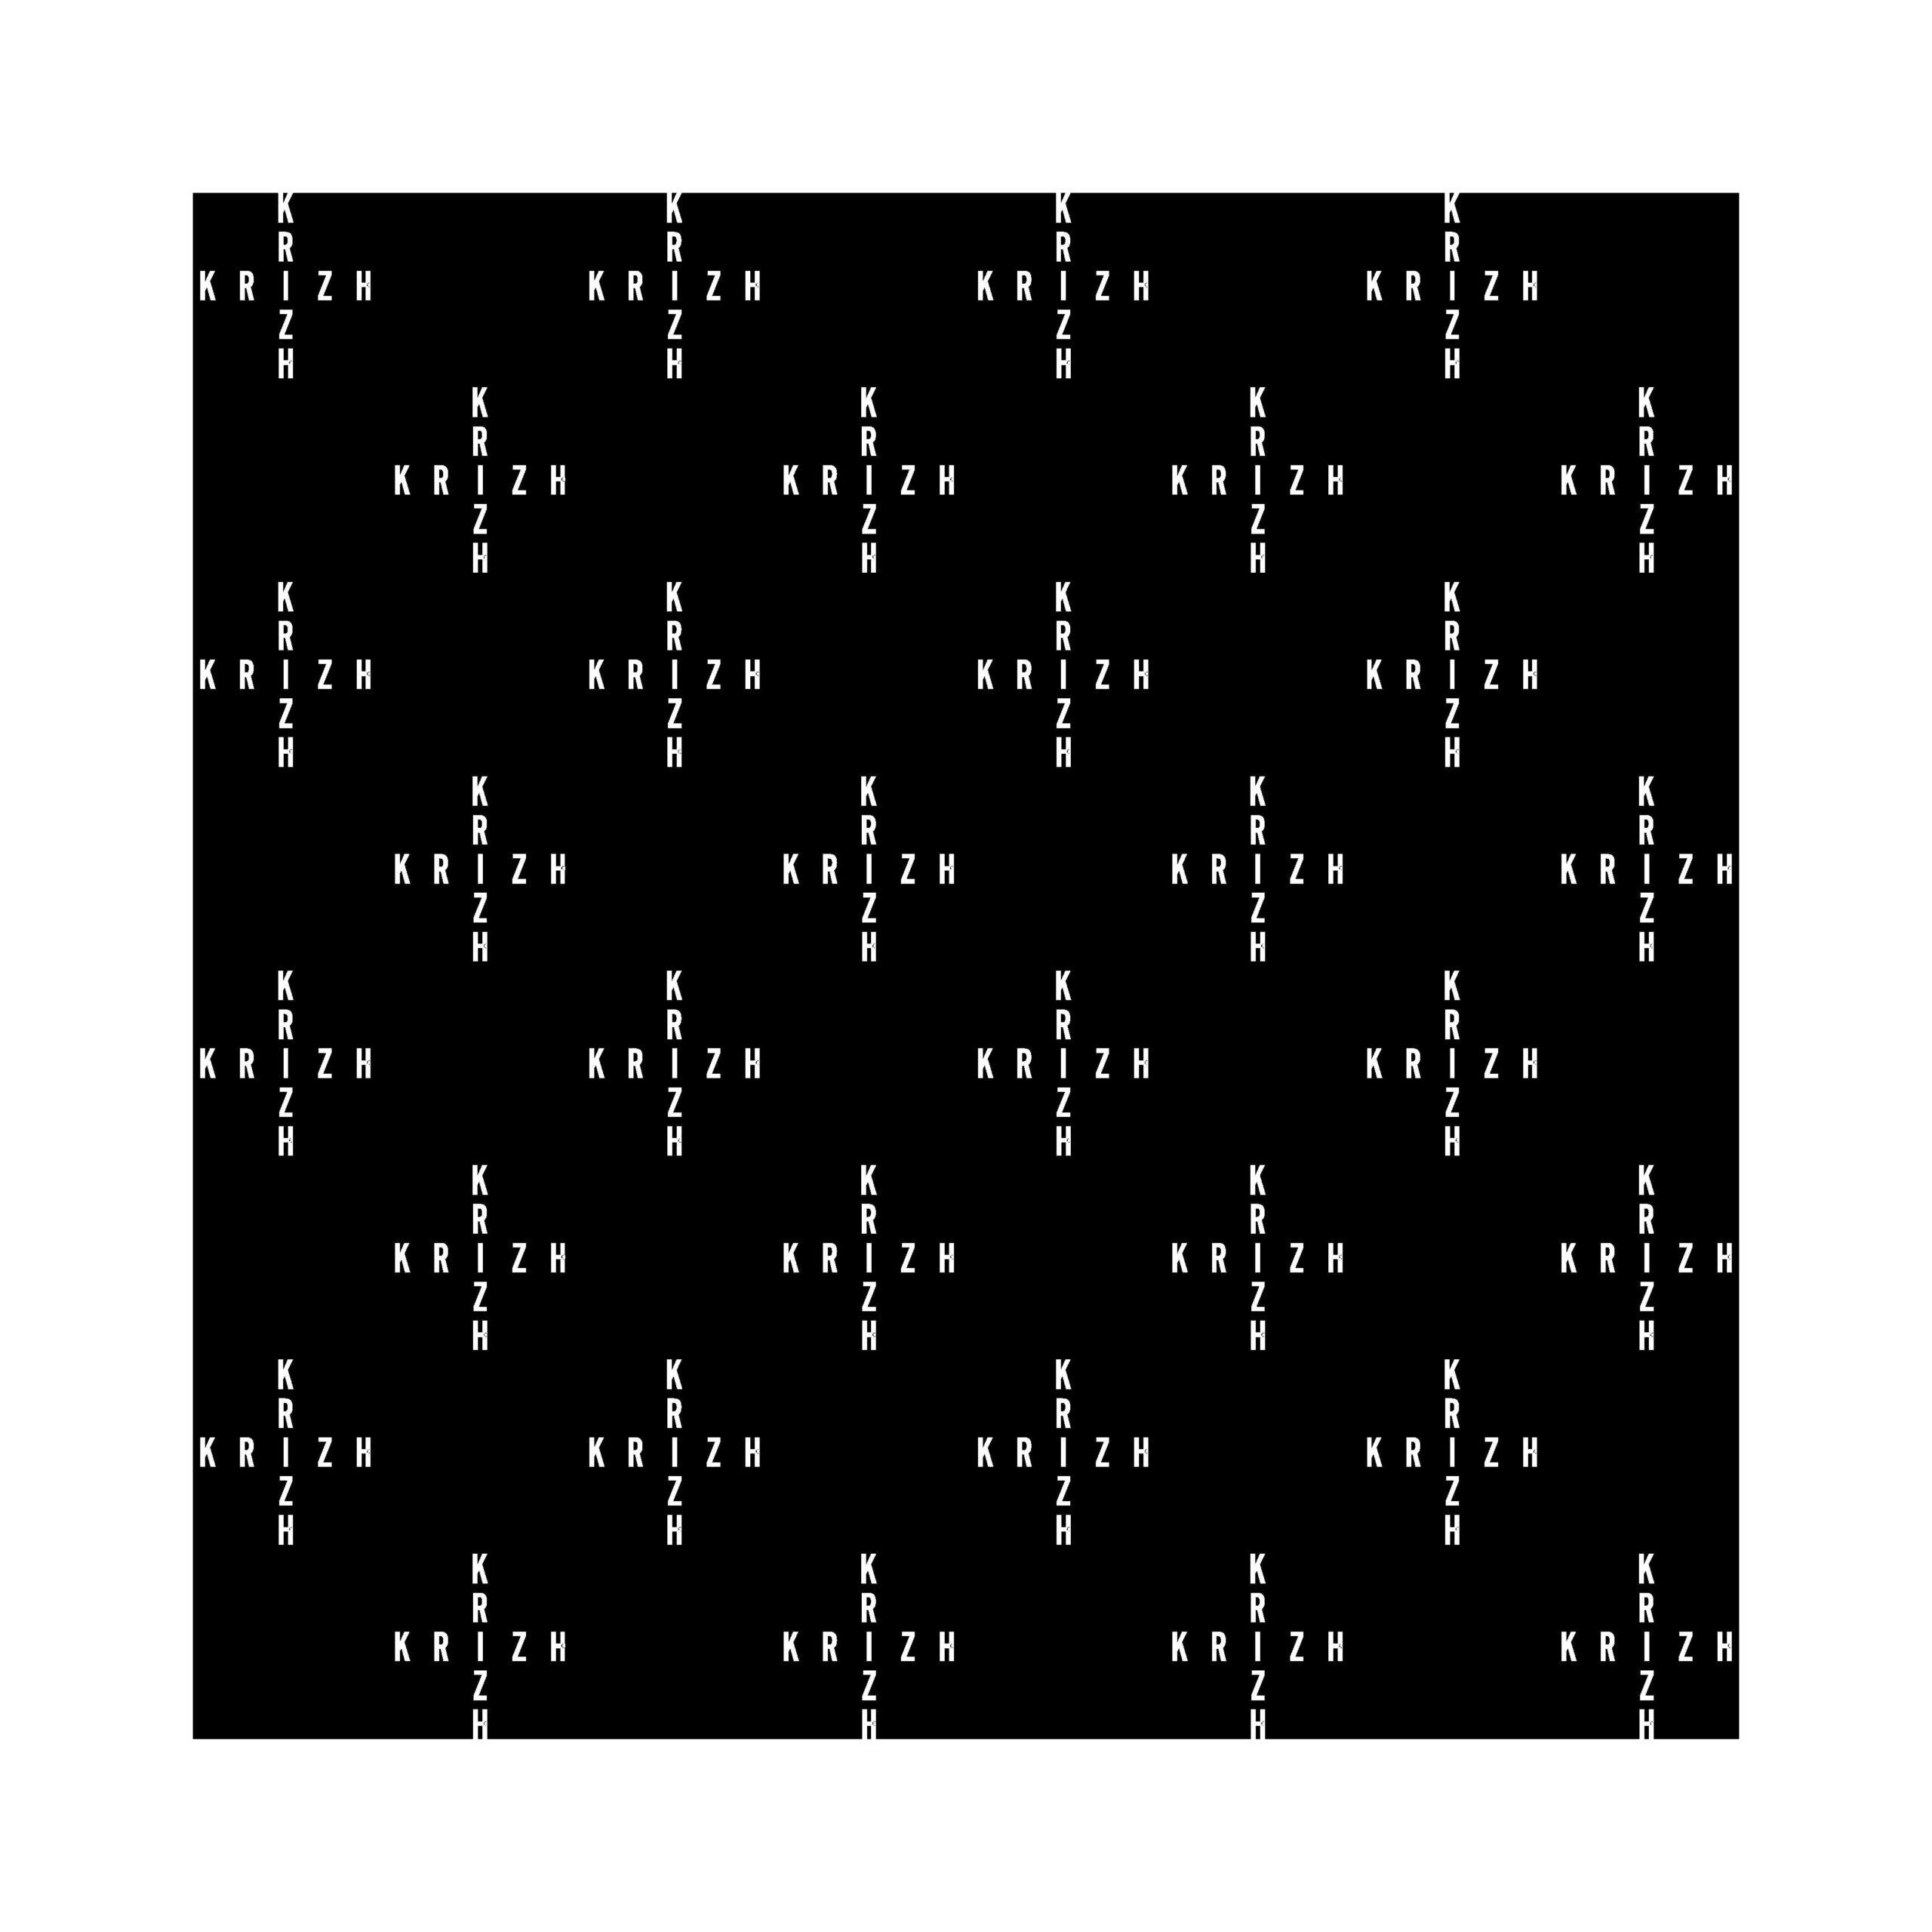 KRIZH Muster Kreuz (3)